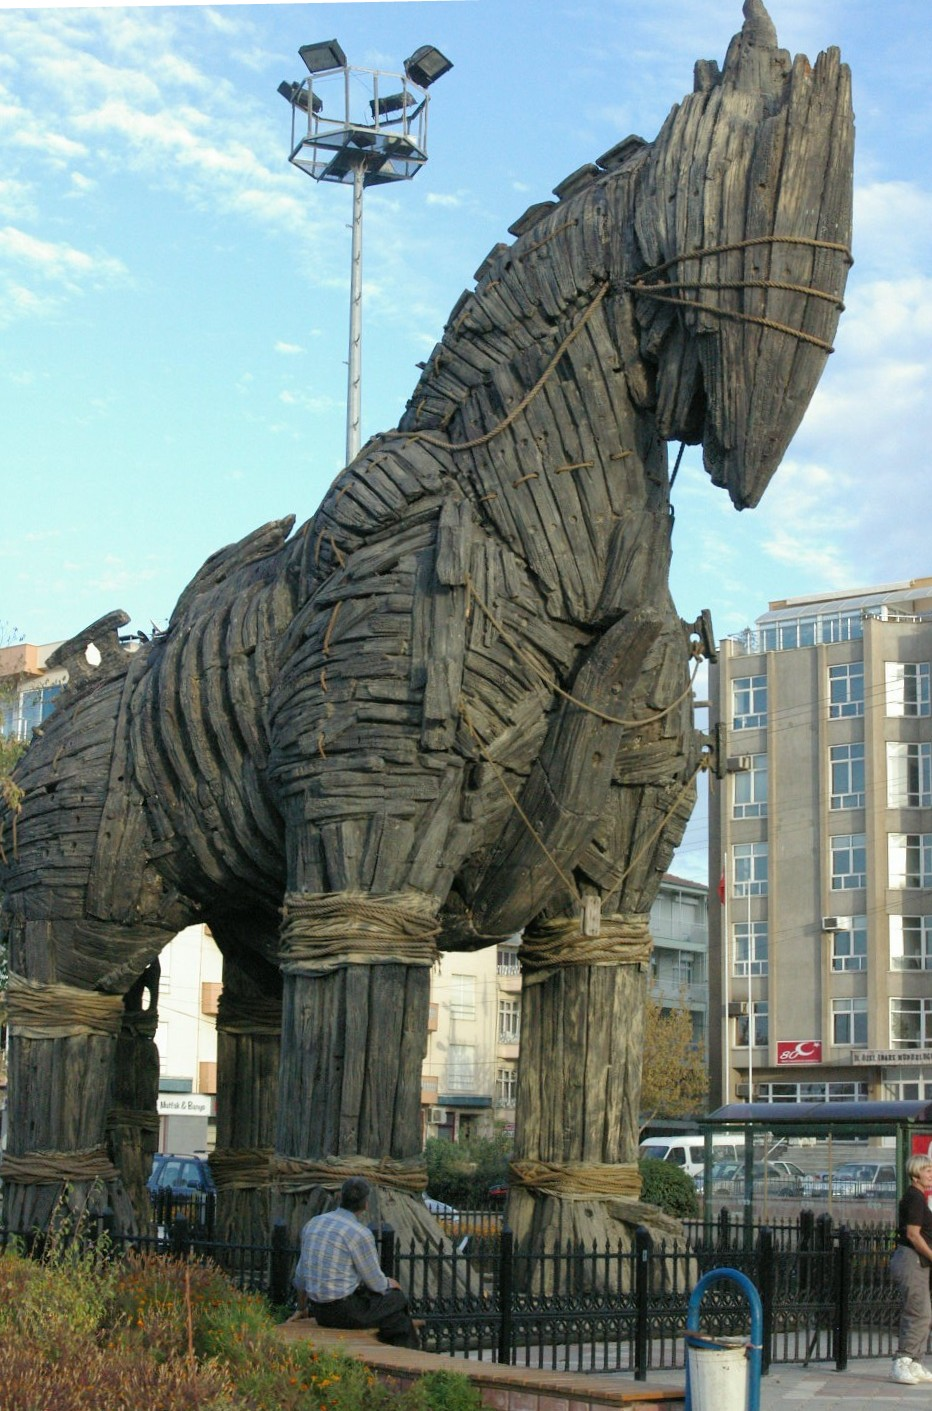 File:Trojan horse Çanakkale.jpg - Wikimedia Commons